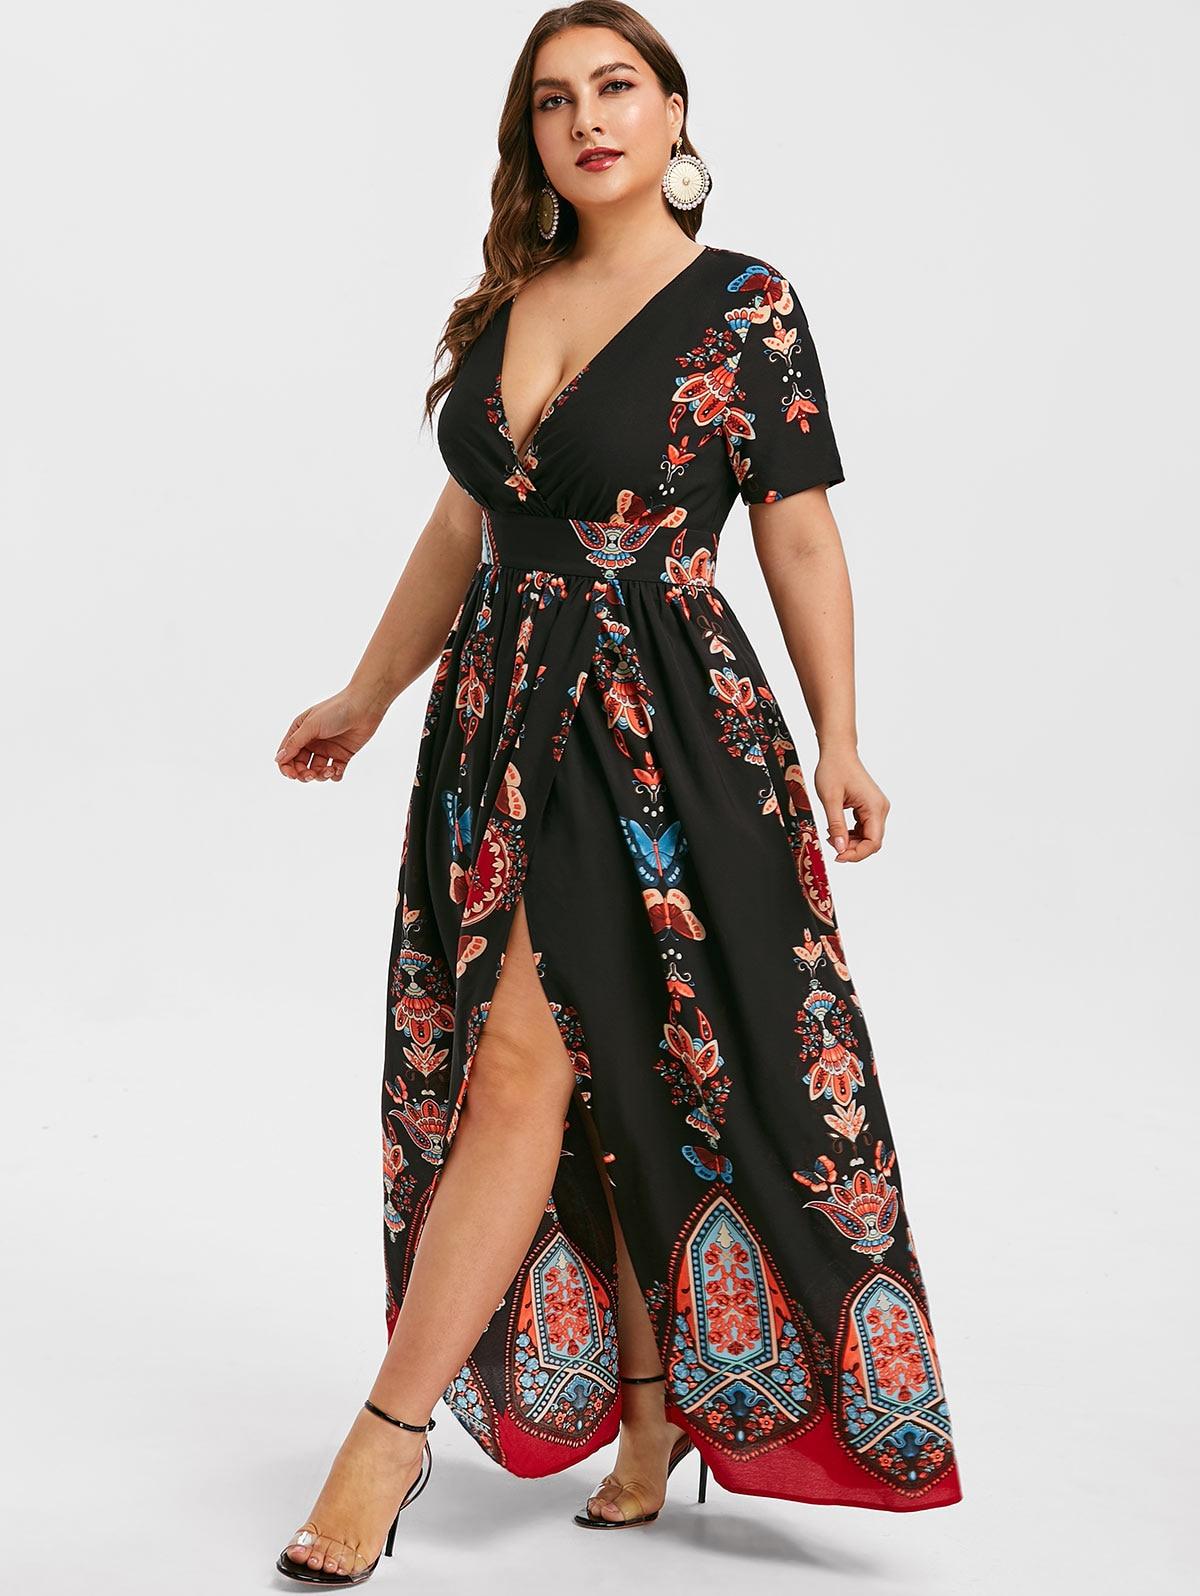 Wipalo Plus Size Printed Maxi Split Dress Bohemian Beach Summer Dress Women Vintage V Neck Floor